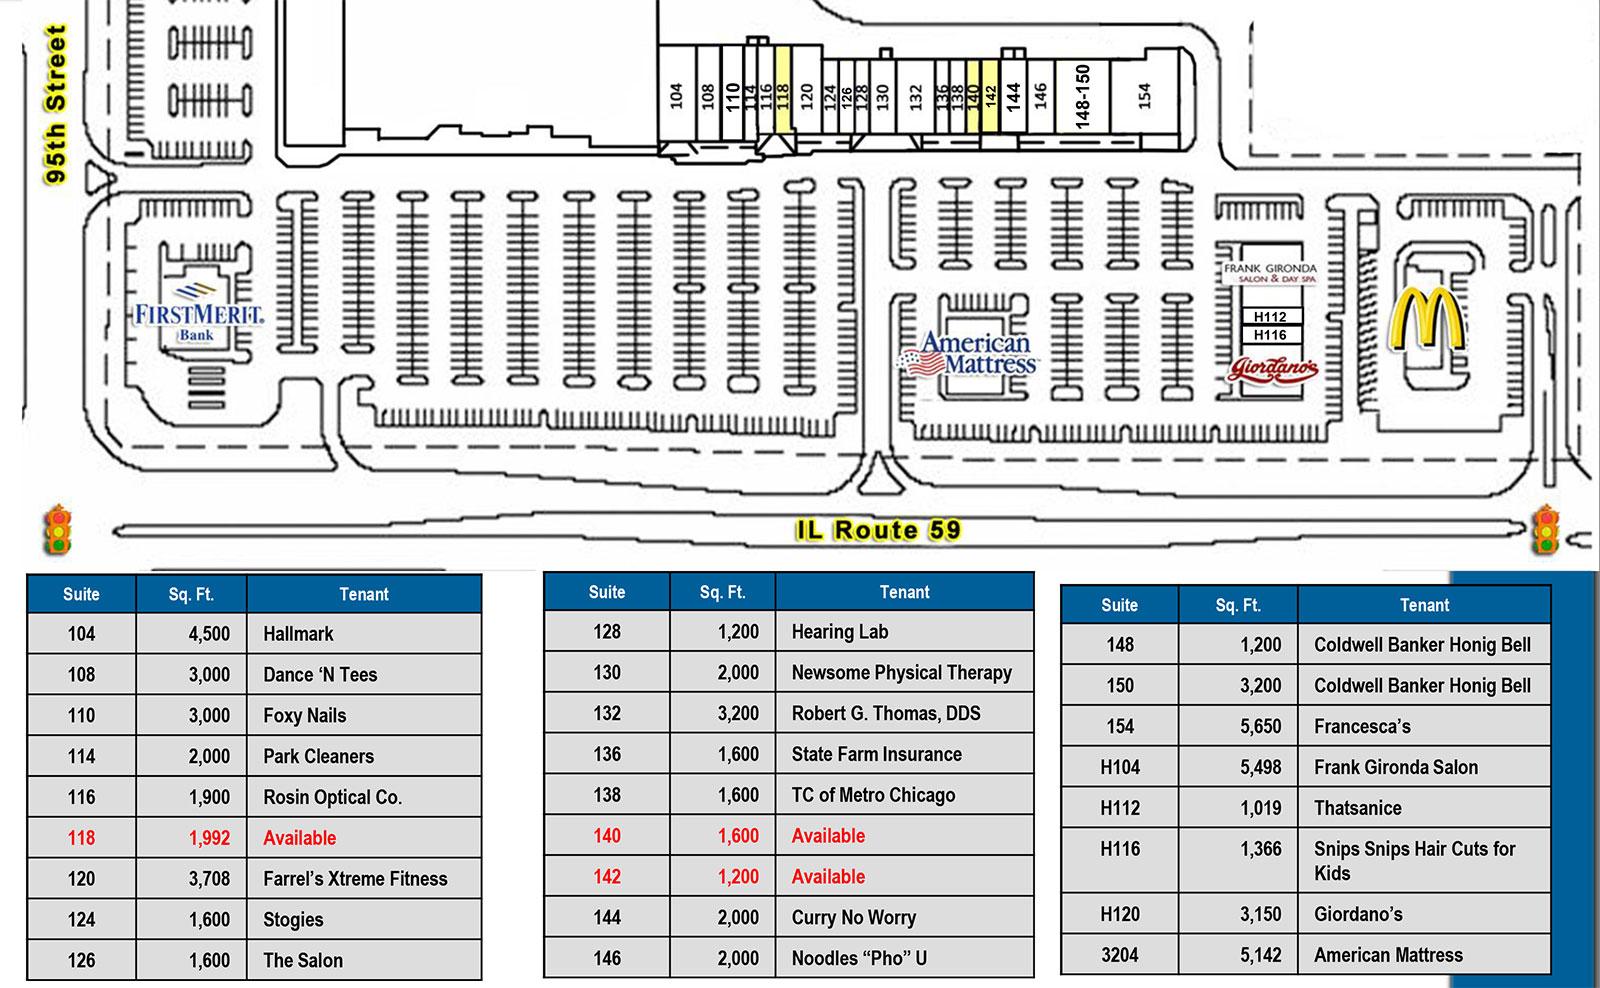 Wheatland Marketplace site plan - Wheatland Marketplace